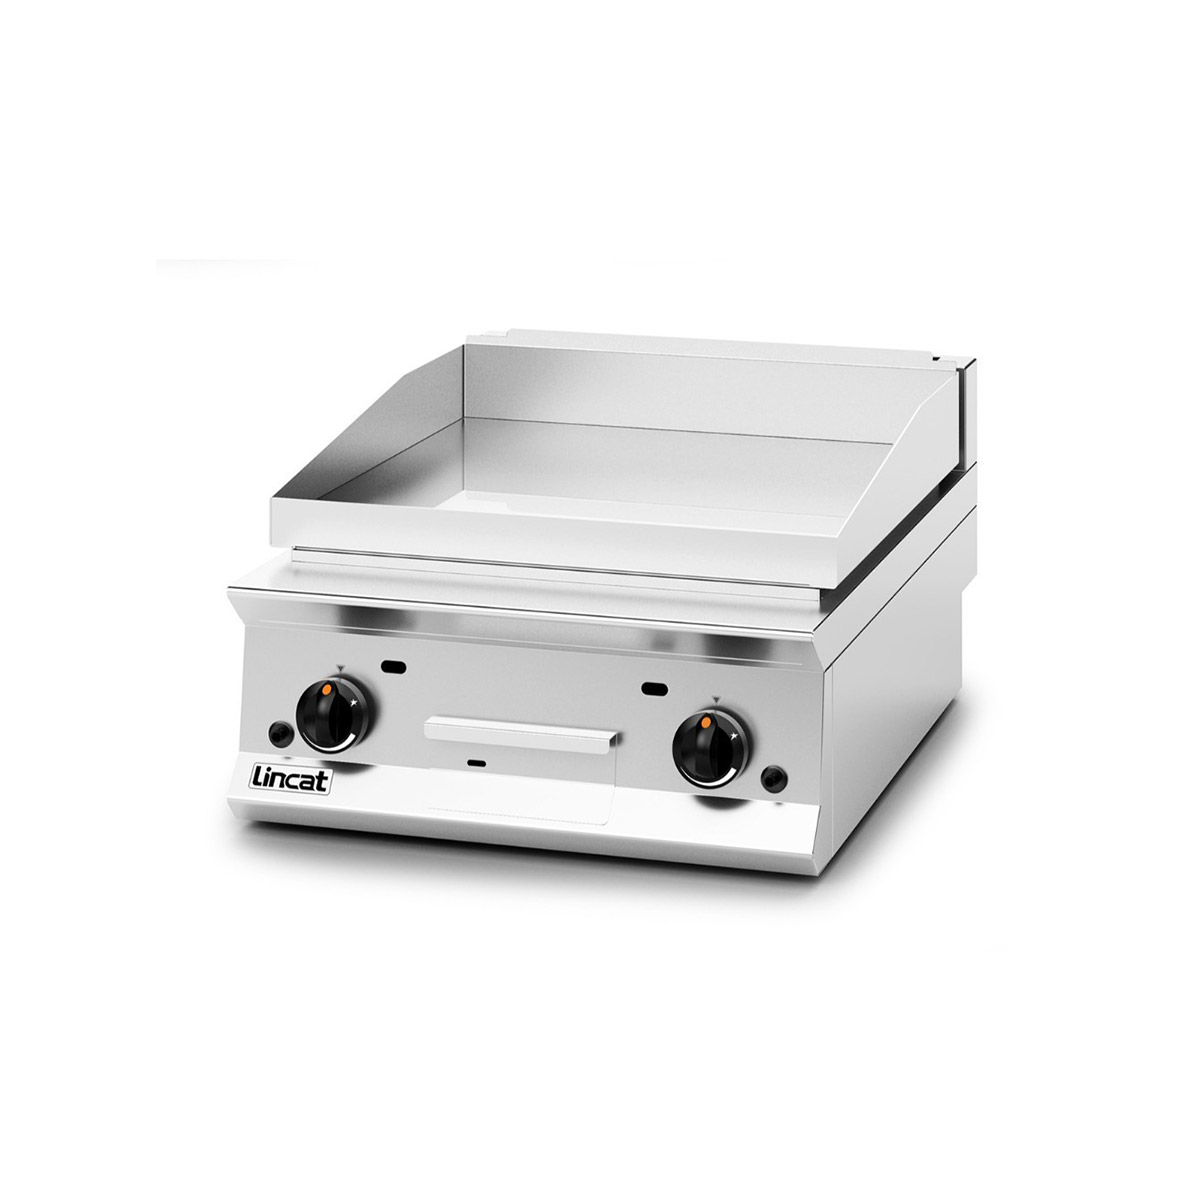 Lincat Opus 800 Chrome Plate Gas Griddle Model: OG8201/C/P (Propane)